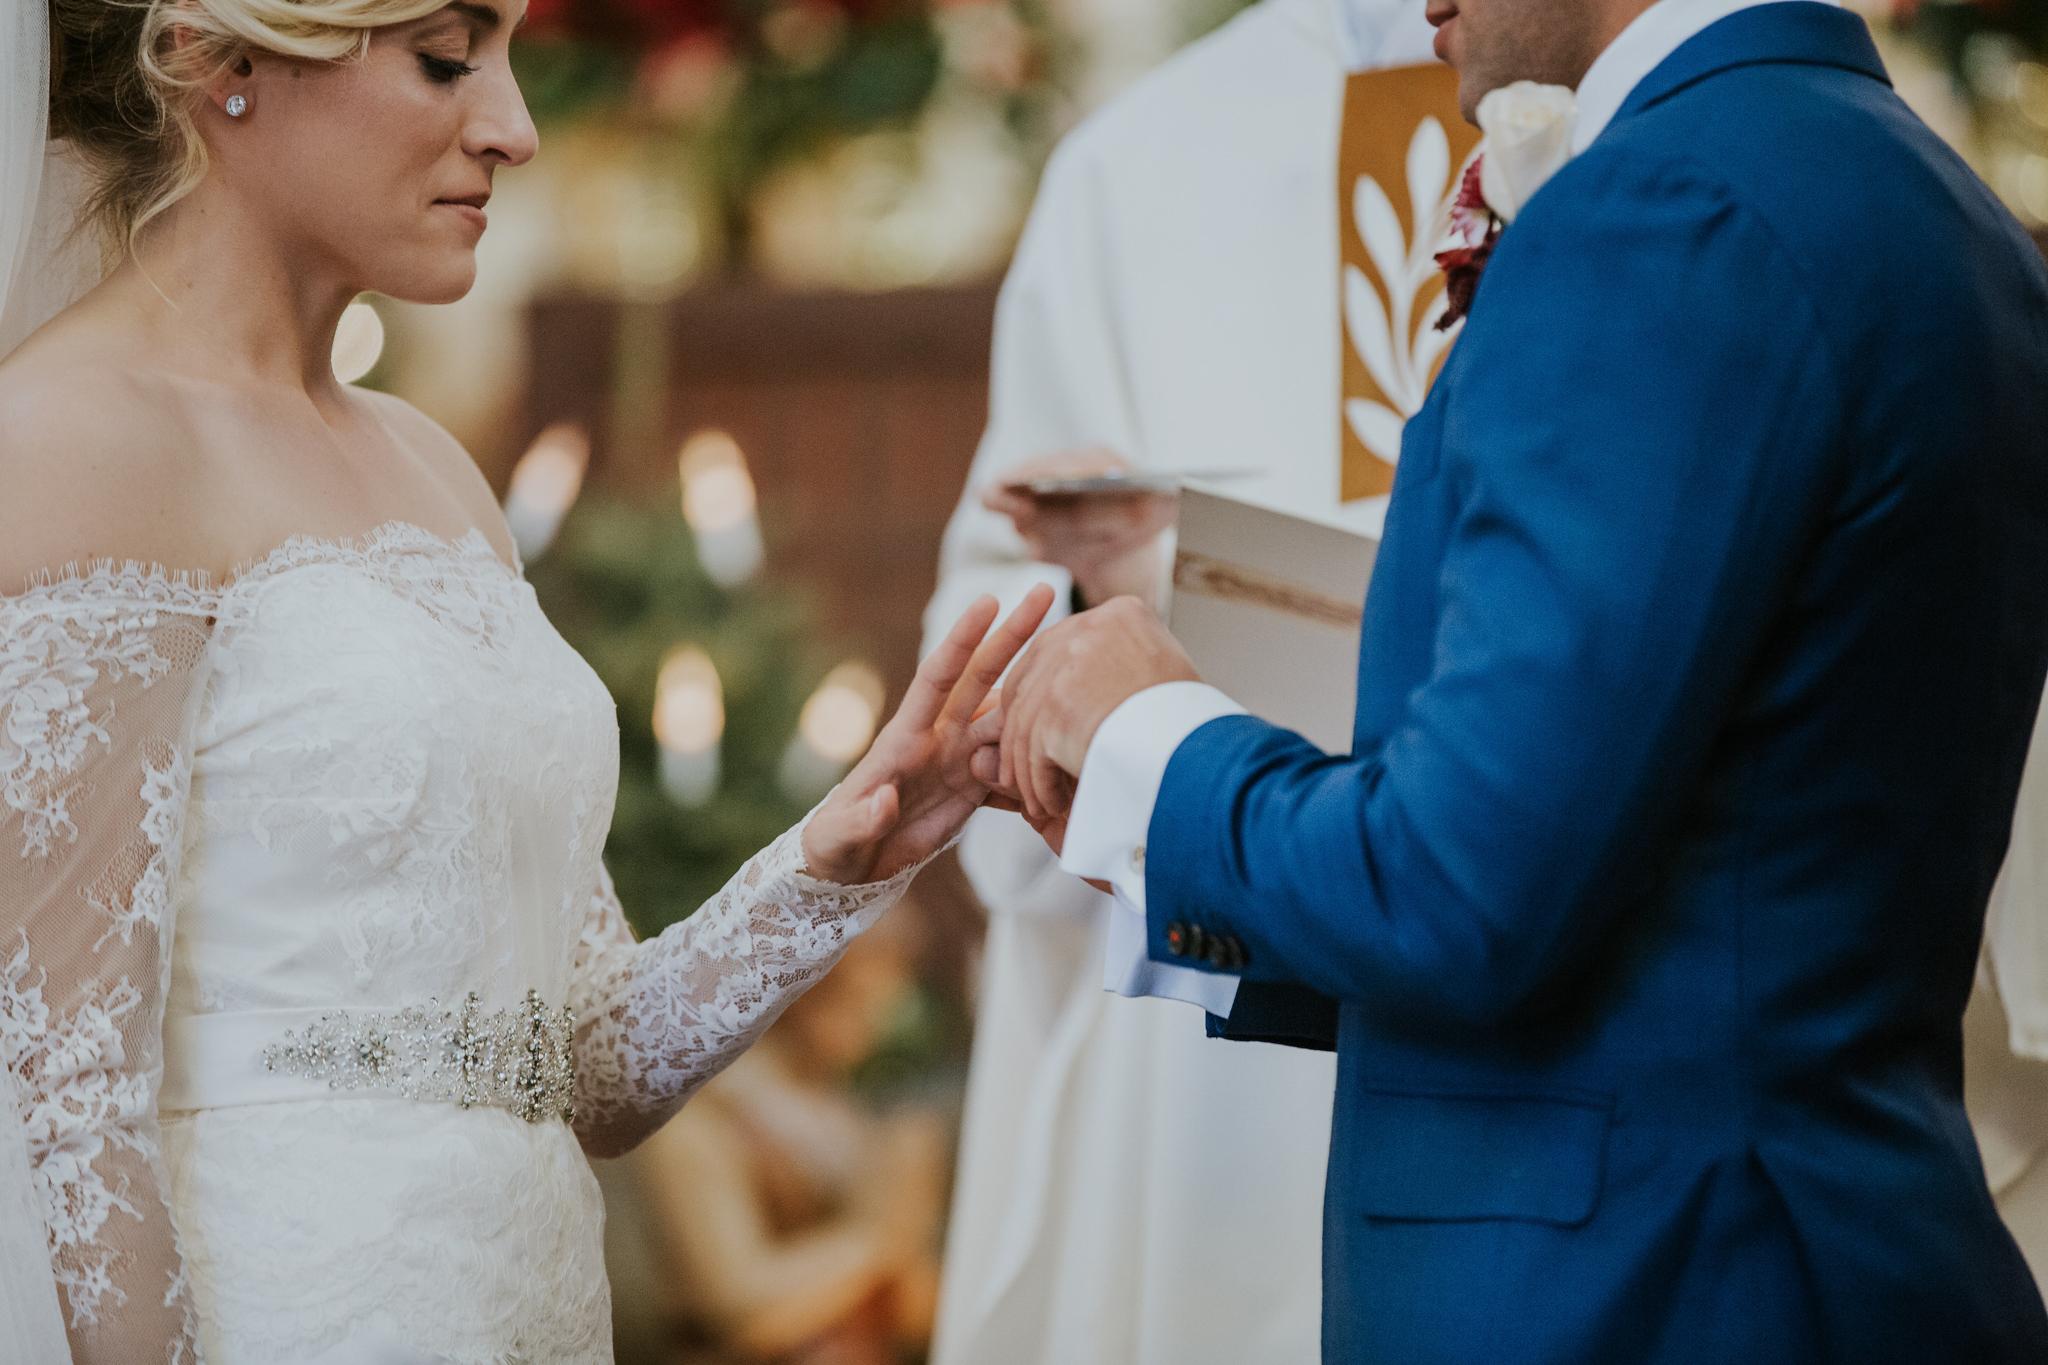 20151230_hussem_wedding_0477_web.jpg